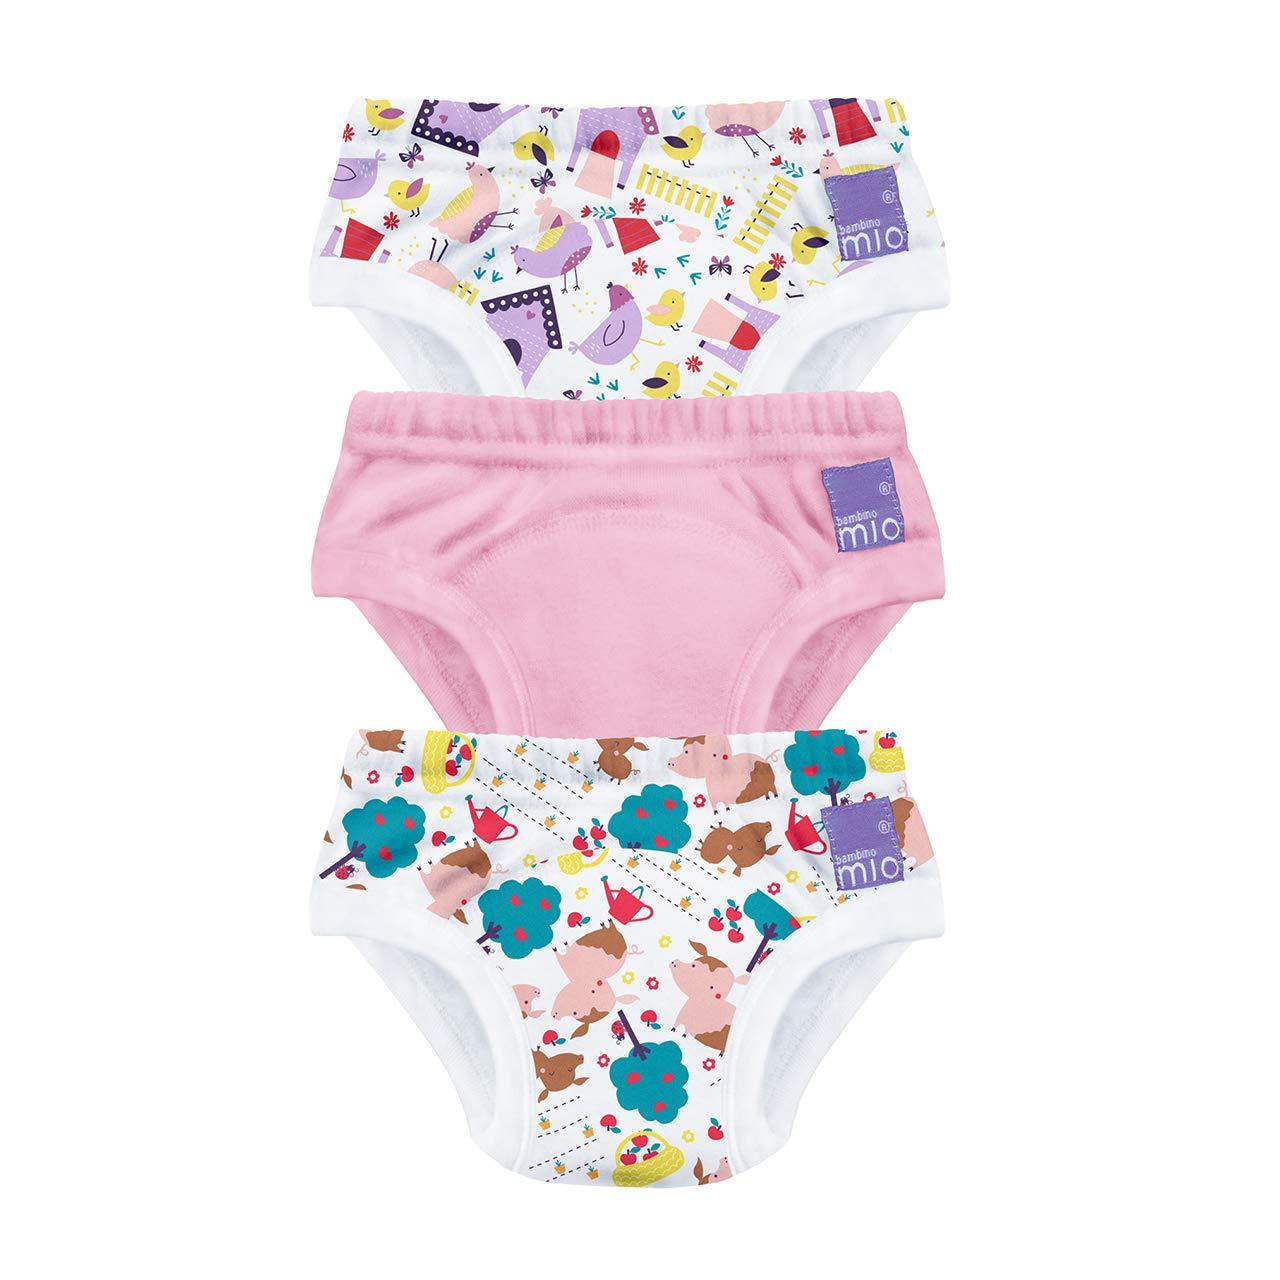 Bambino Mio Bambino Mio, Potty Training Pants, Puddle Pigs, 3+ Years, 3 Pack